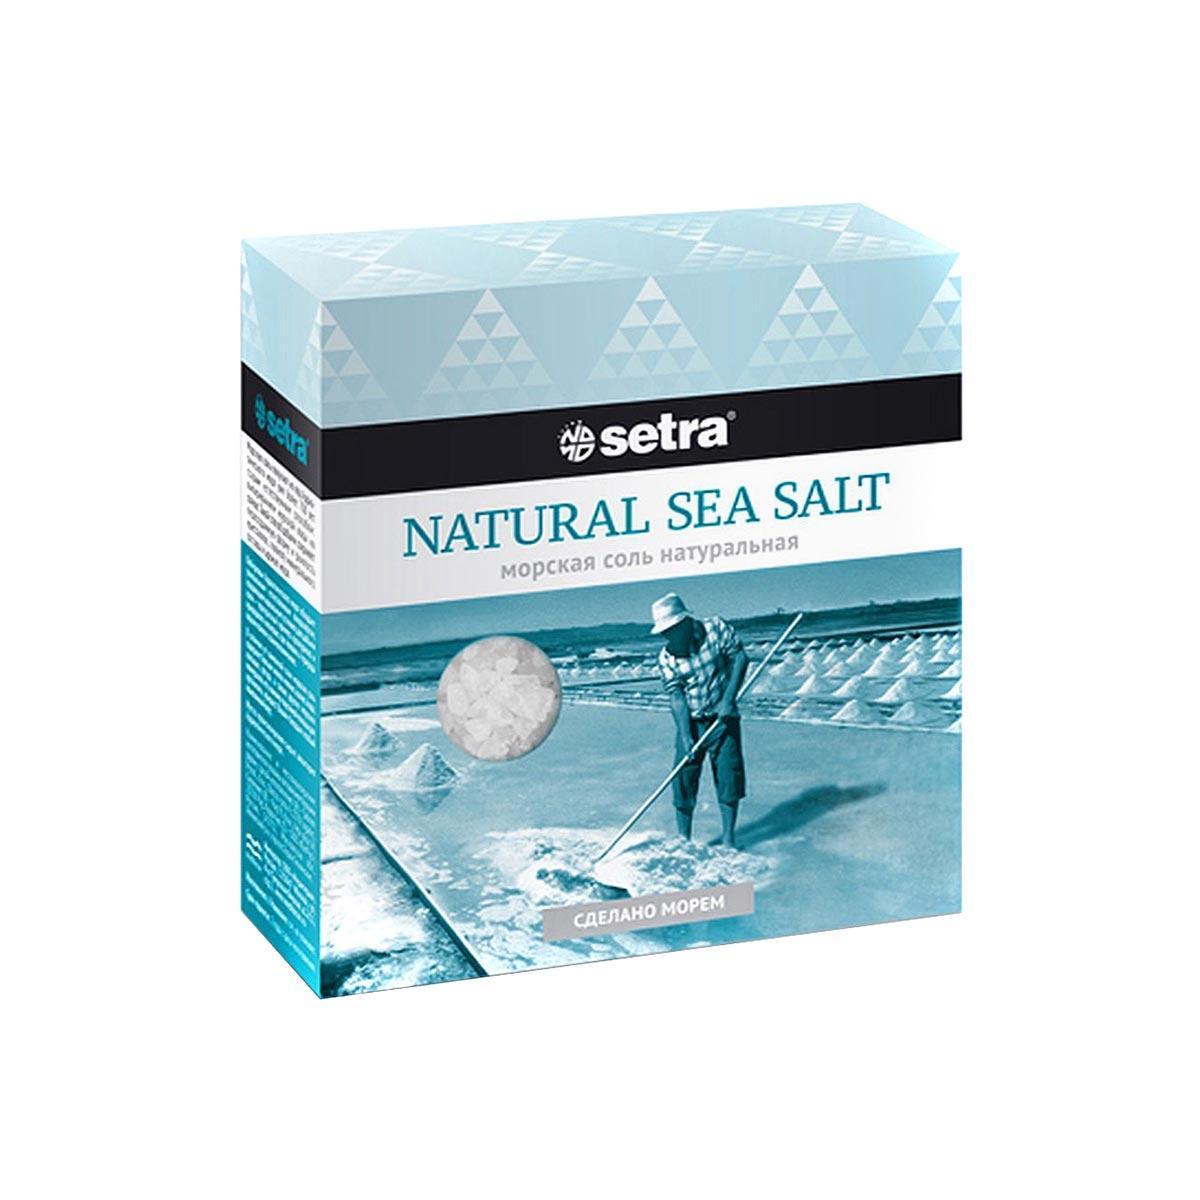 Соль морская крупная натуральная Setra 500 г